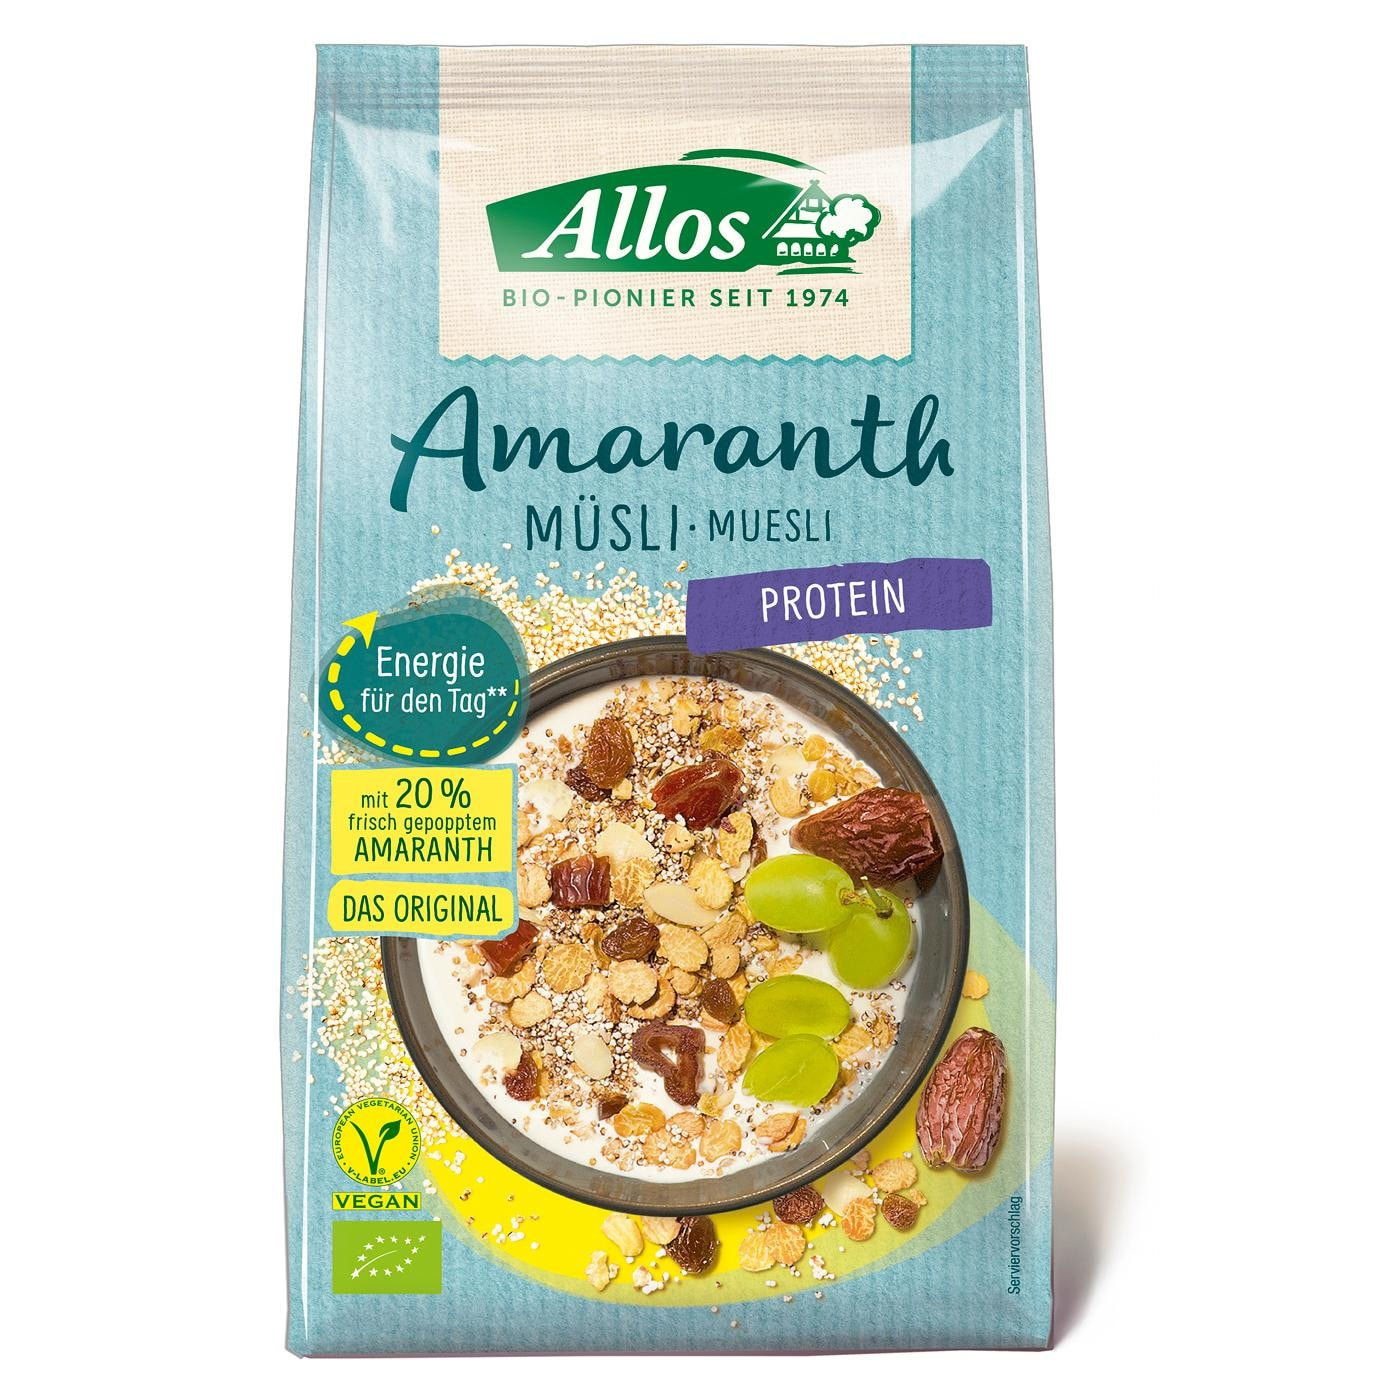 Allos Bio Amaranth Protein Müsli 375g